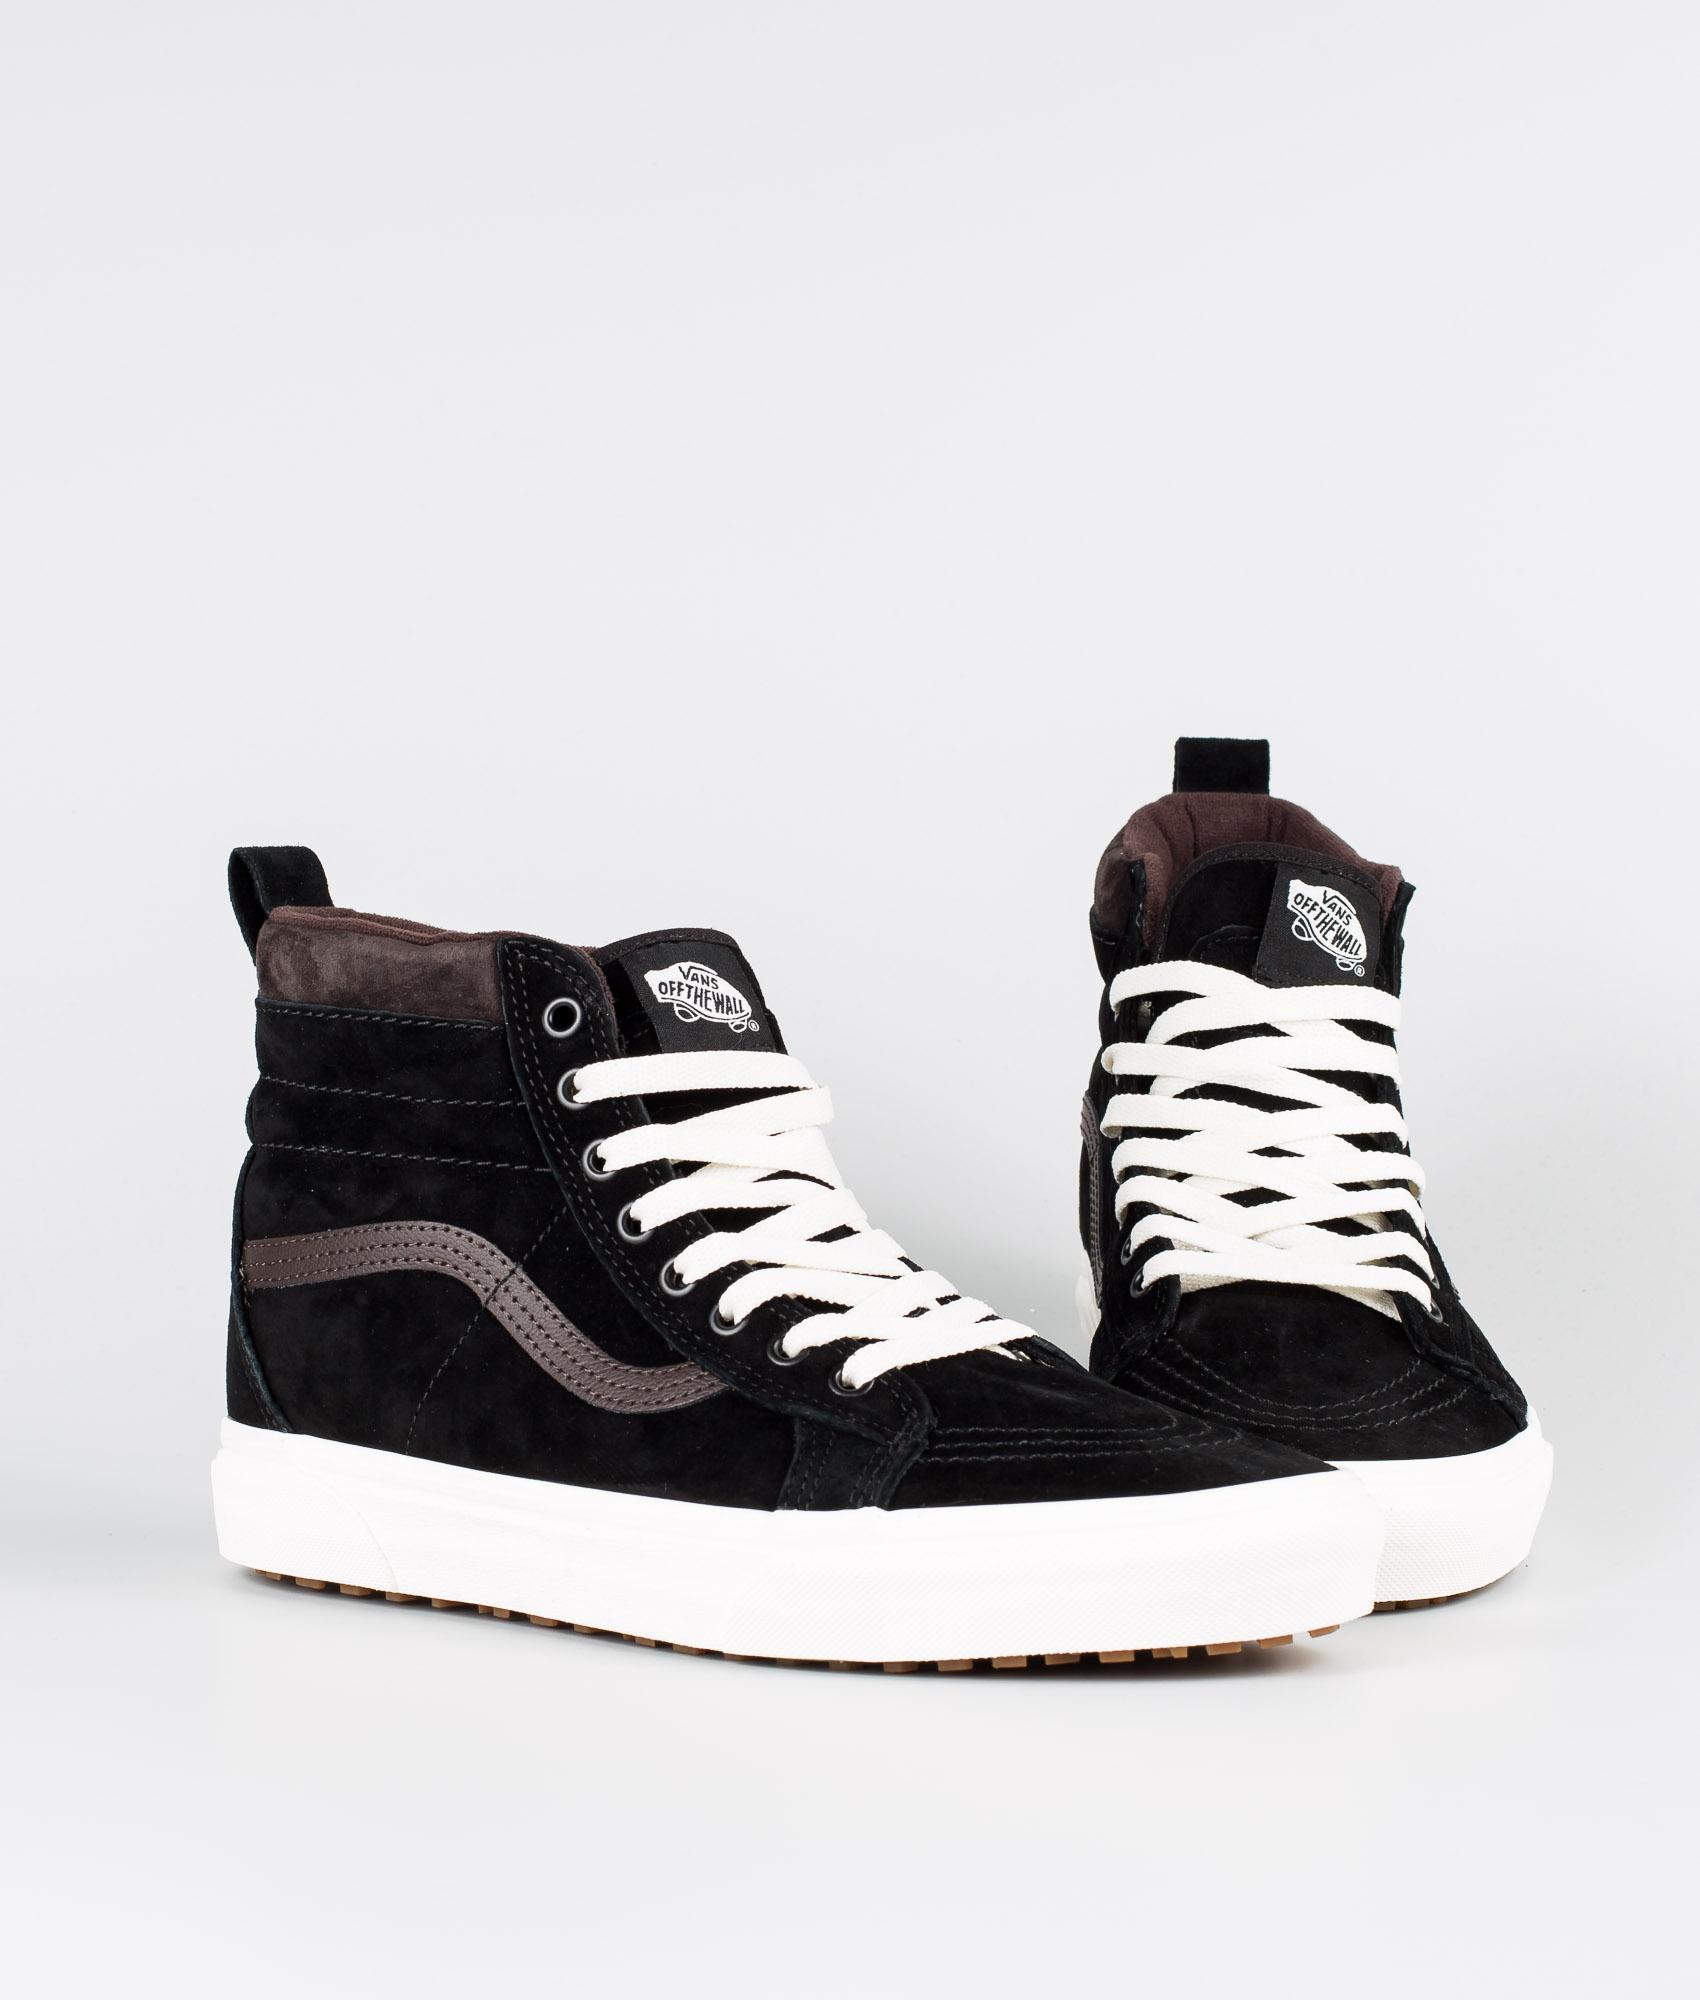 Vans Sk8 Hi MTE Chaussures (MTE) BlackChocolate Torte